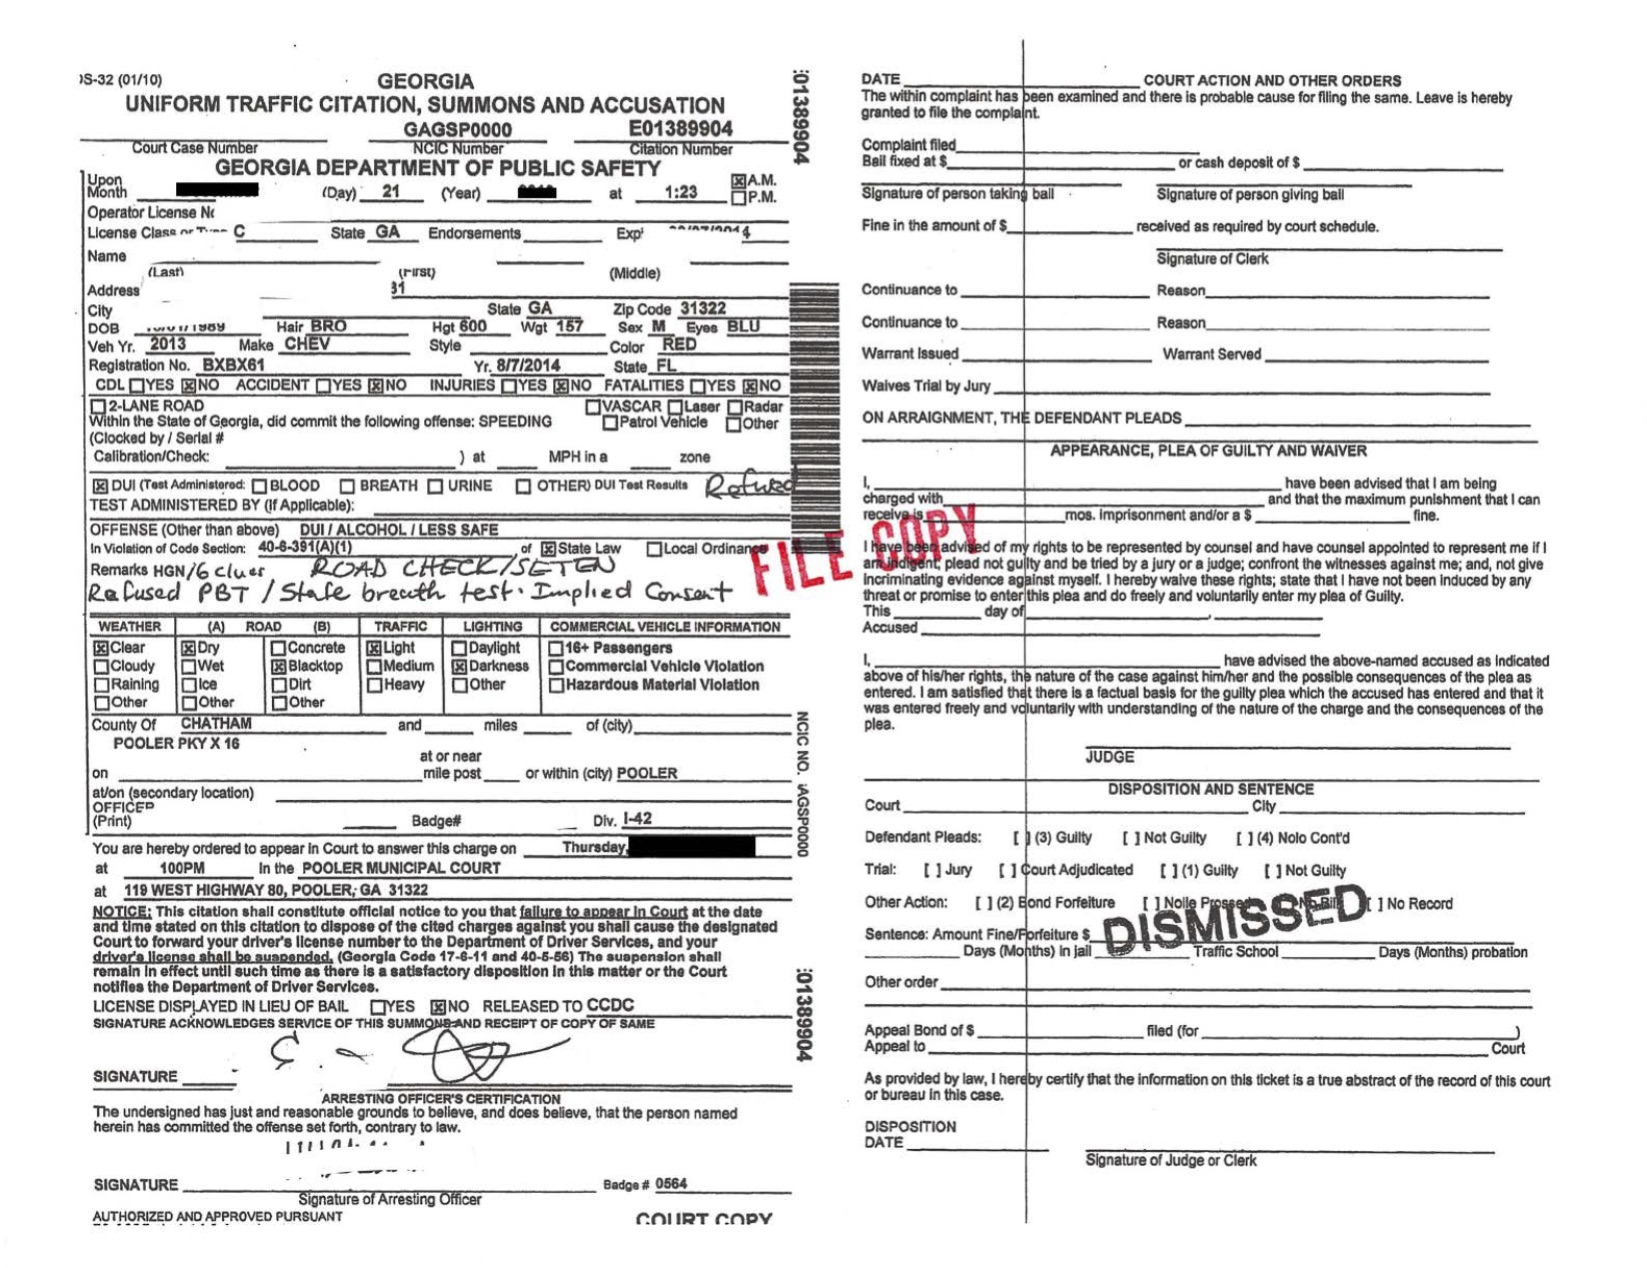 Pooler DUI less safe dismissed by Jason Cerbone DUI Lawyer Savannah, Georgia